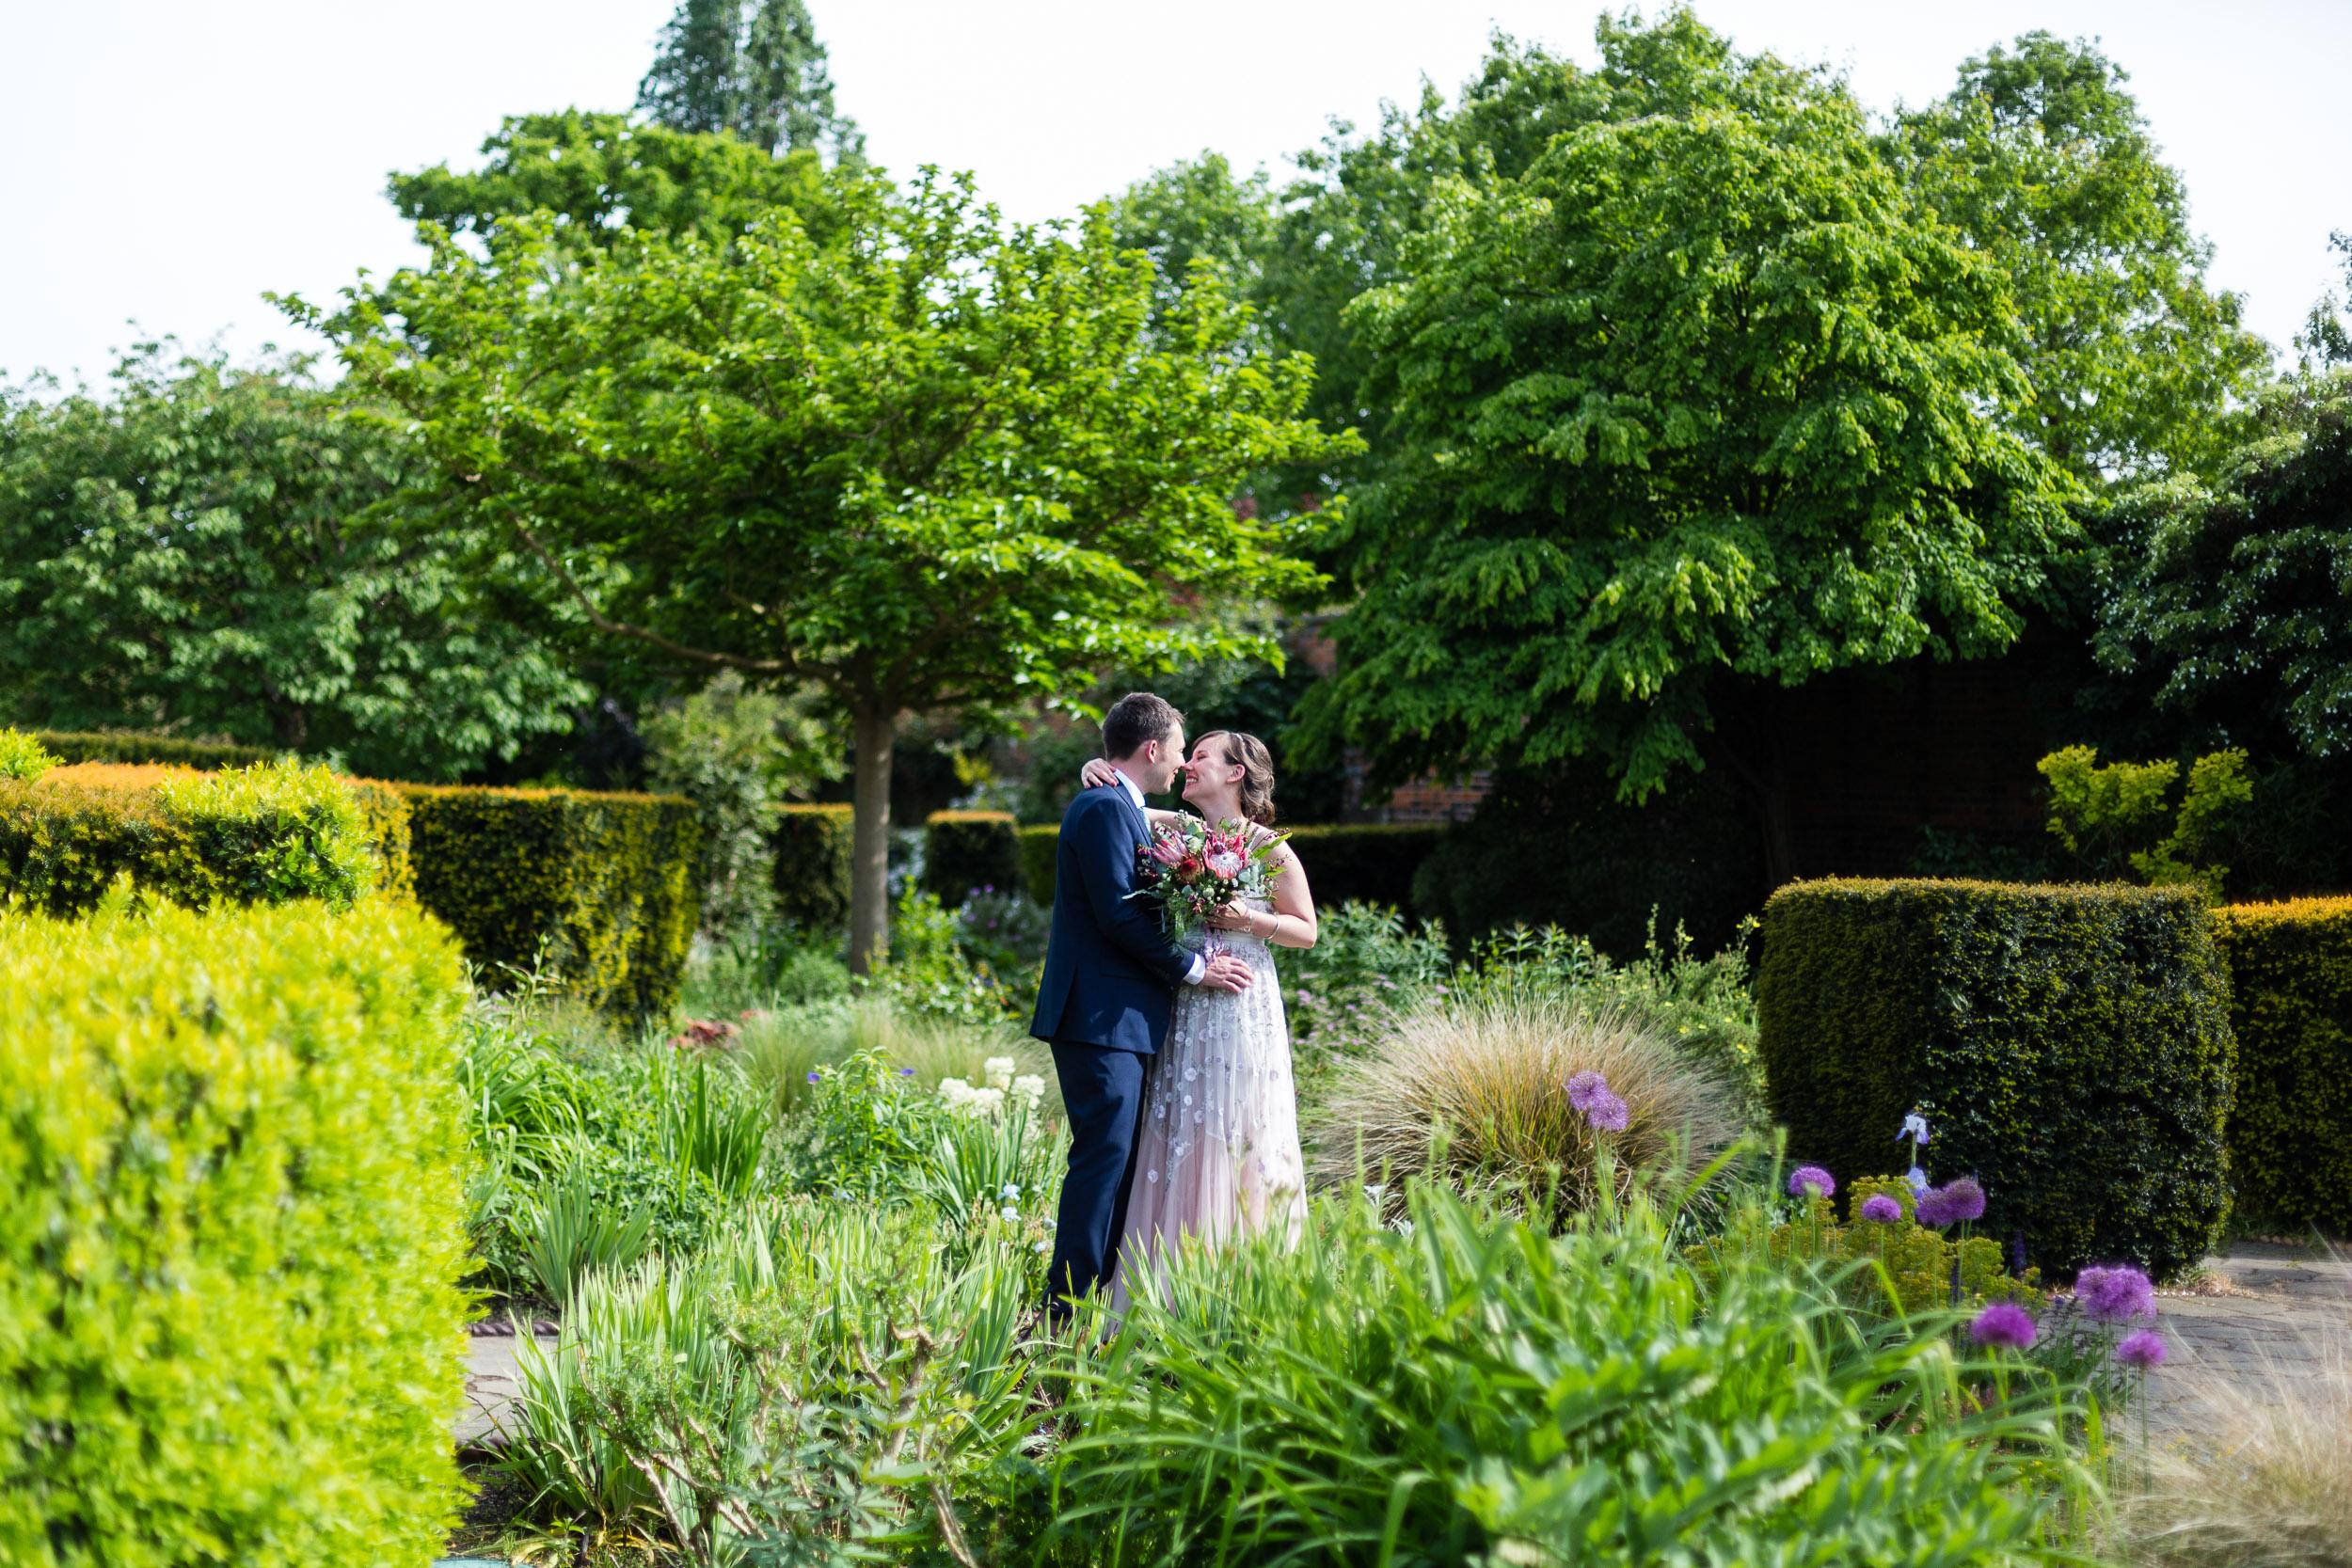 brockwell-lido-brixton-herne-hill-wedding-280.jpg